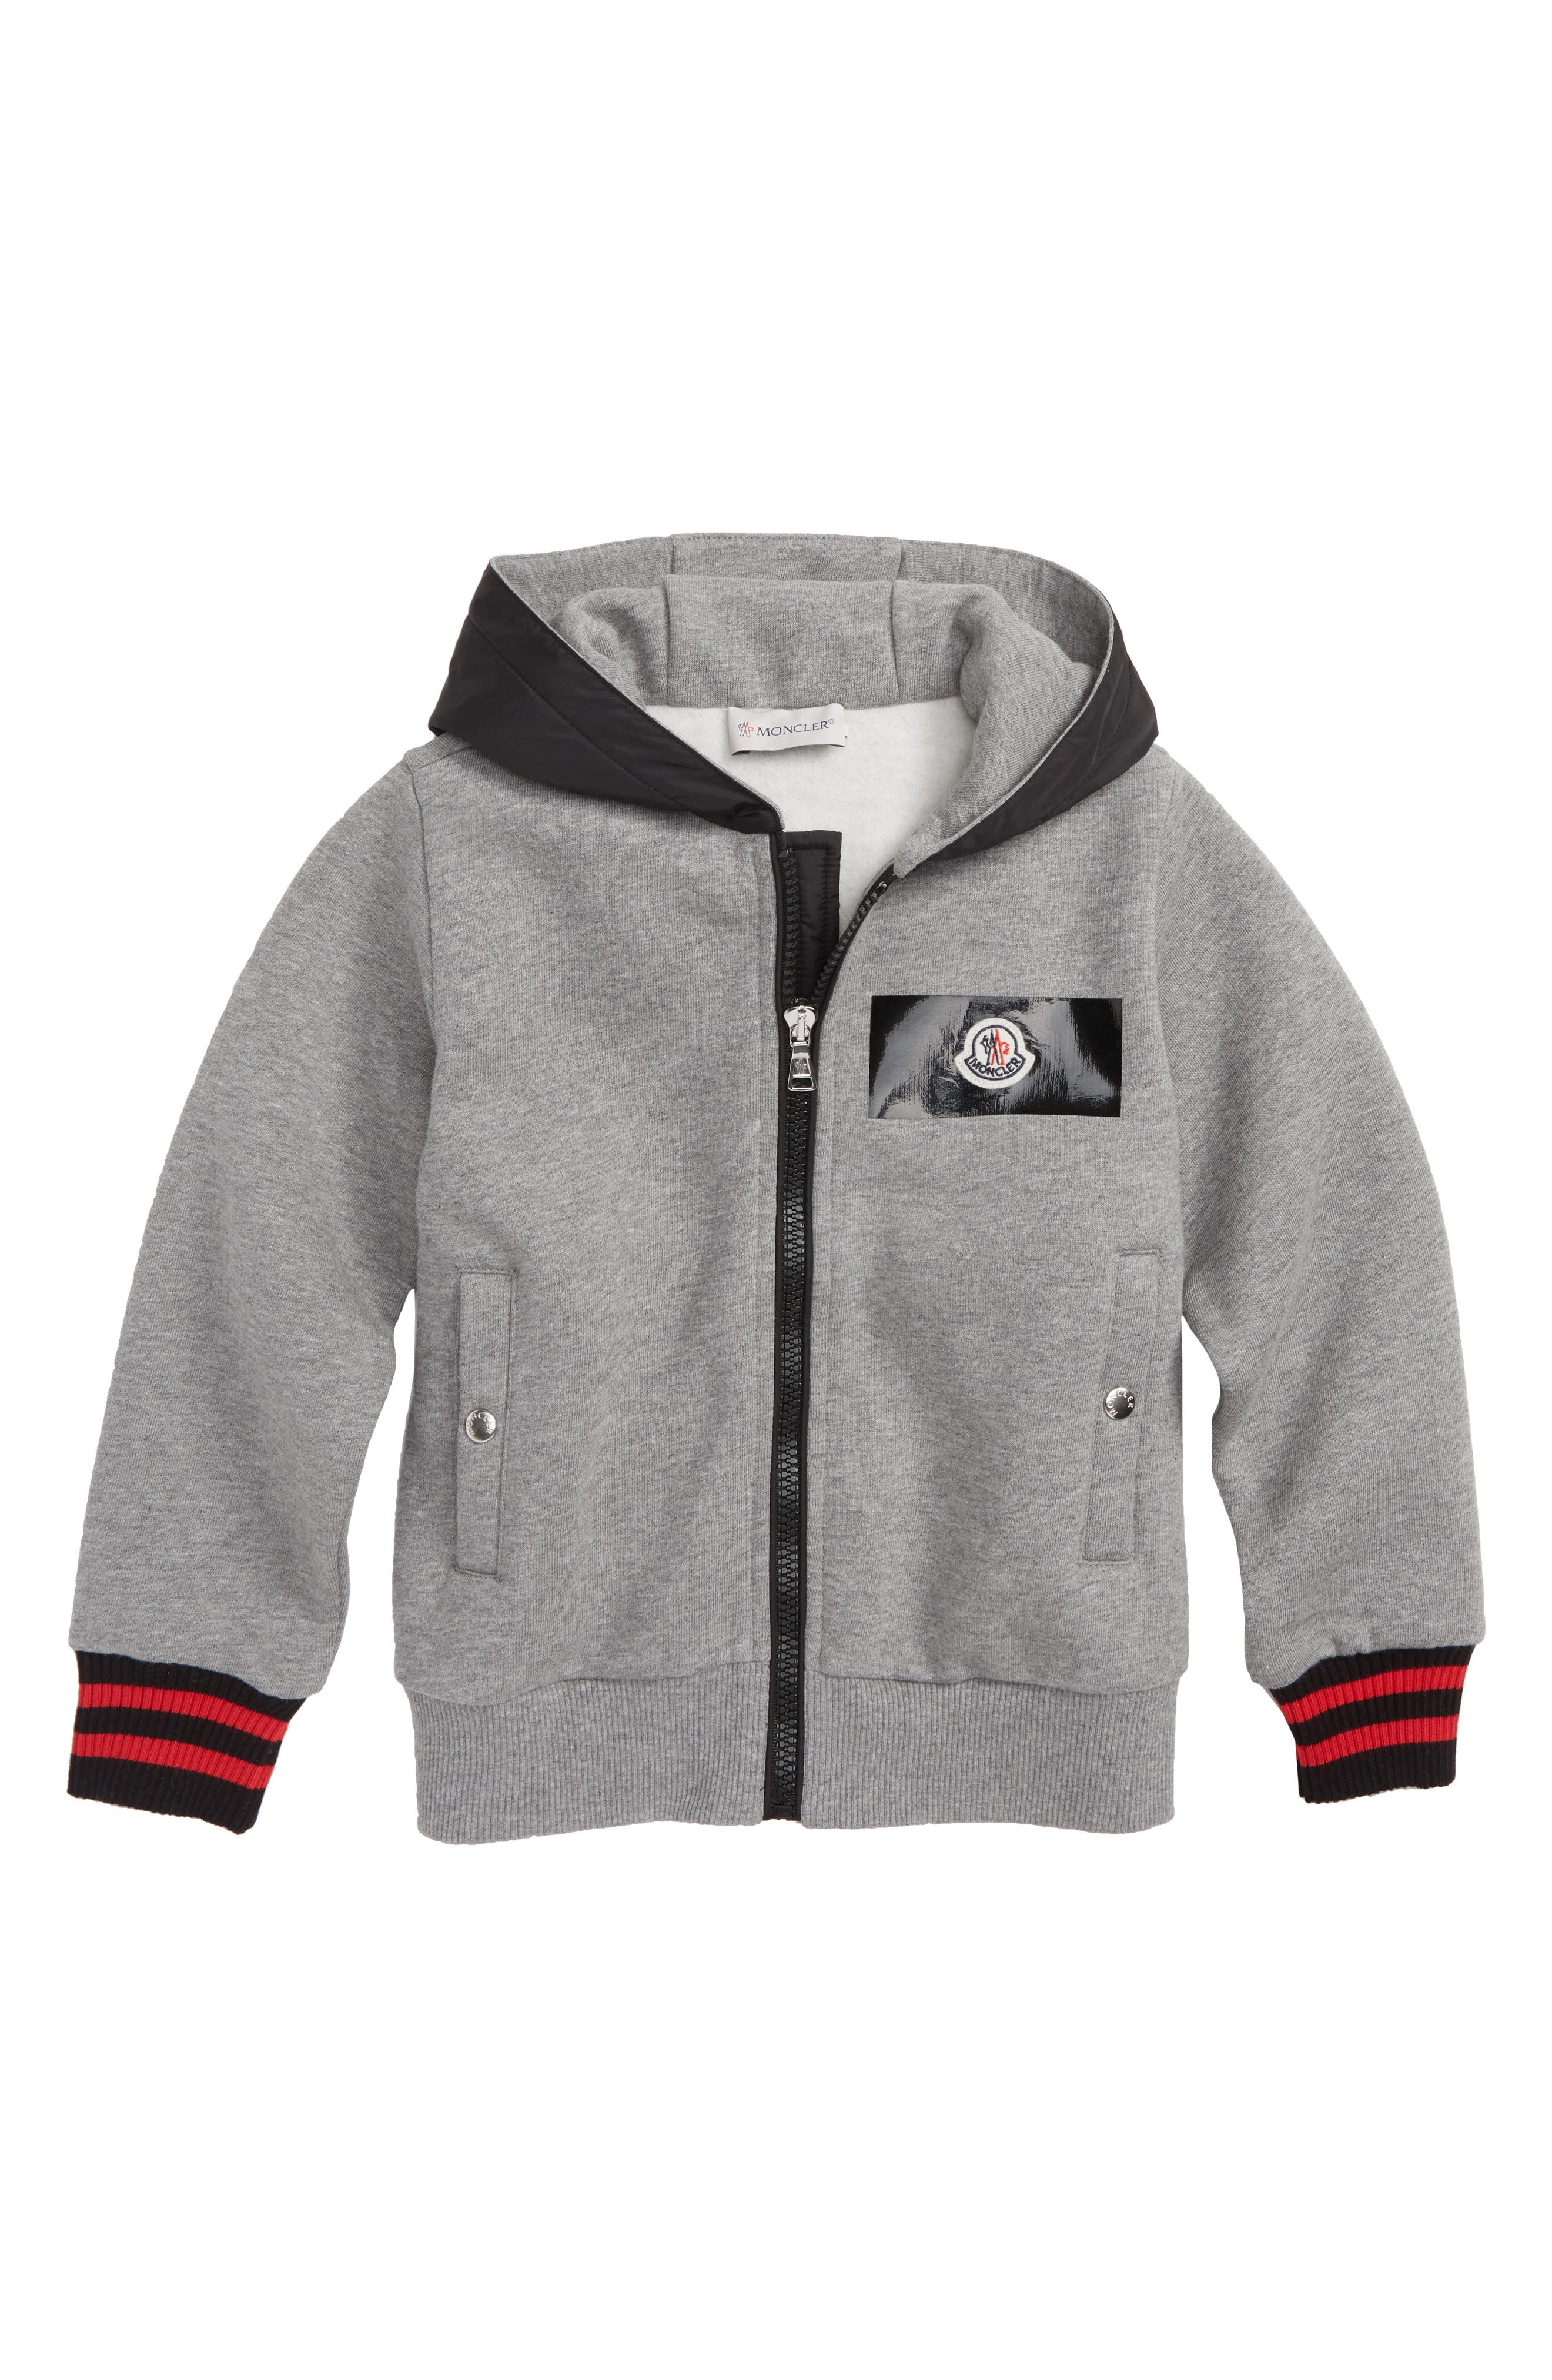 13562892d378 Boys  Moncler Clothing  Hoodies